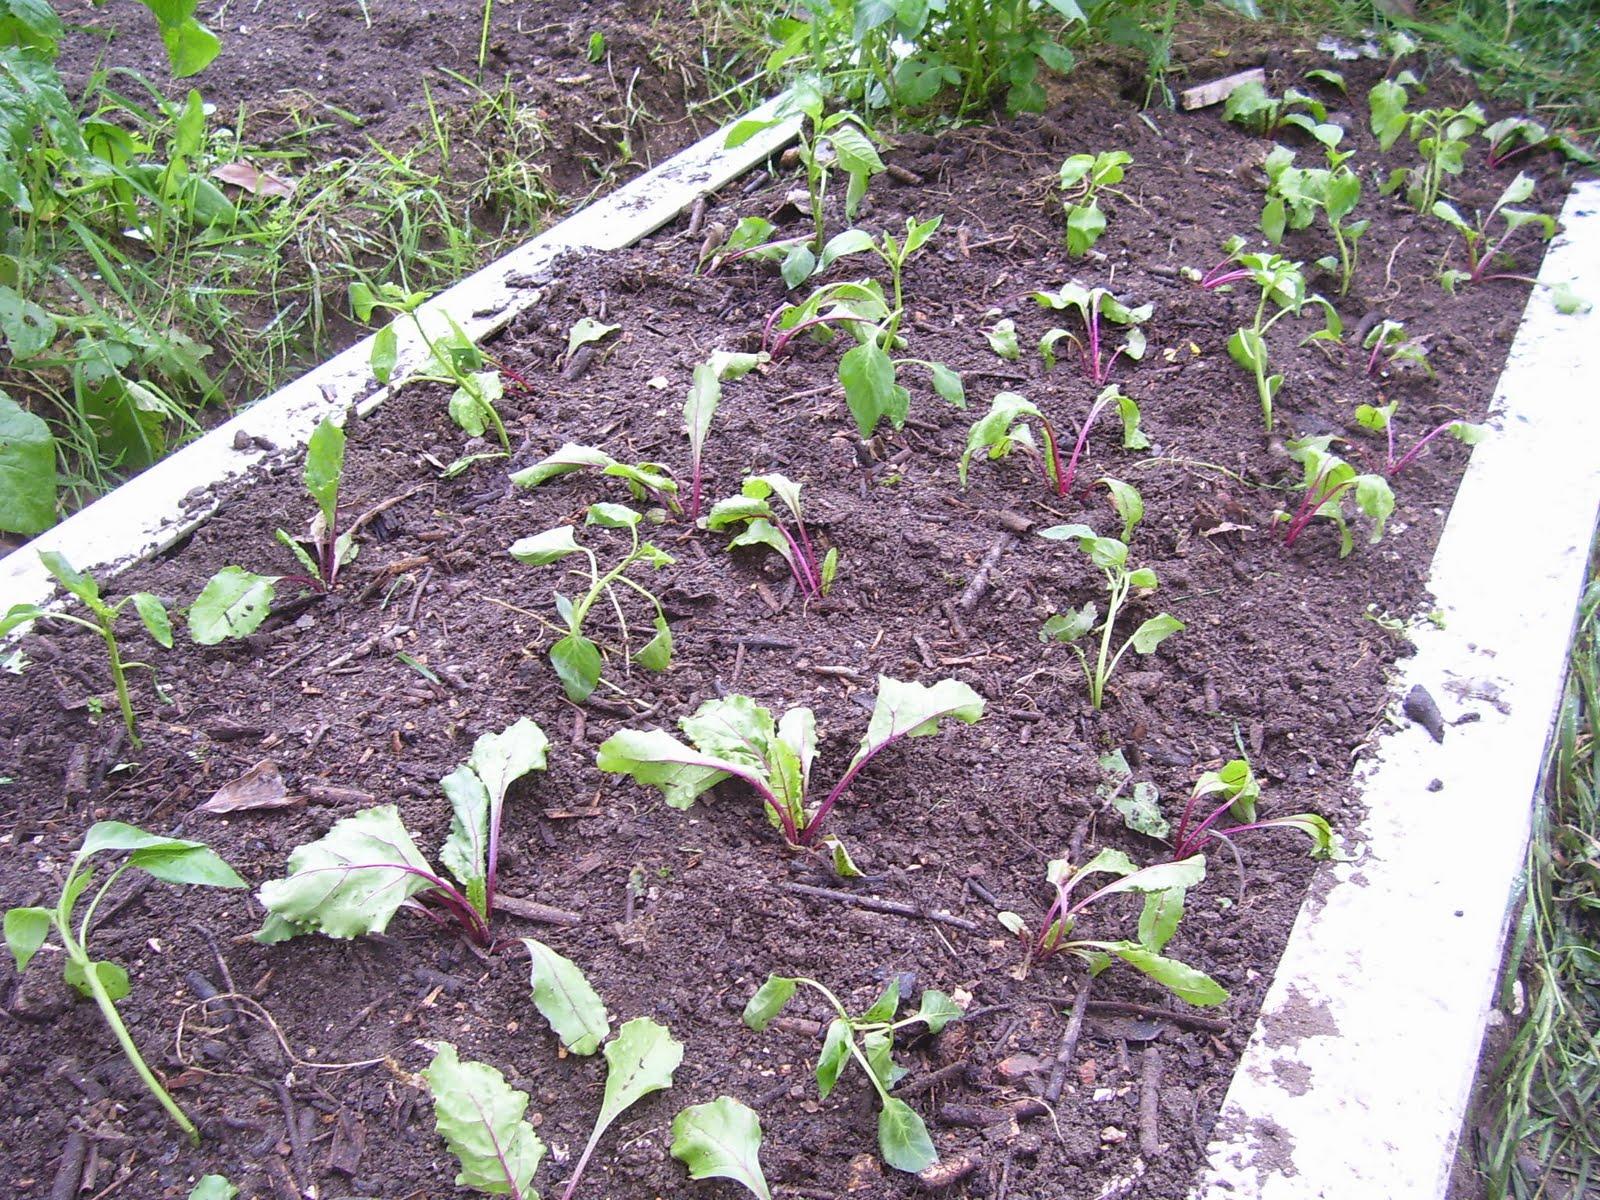 la plaza de mertesaker plantar r banos primera